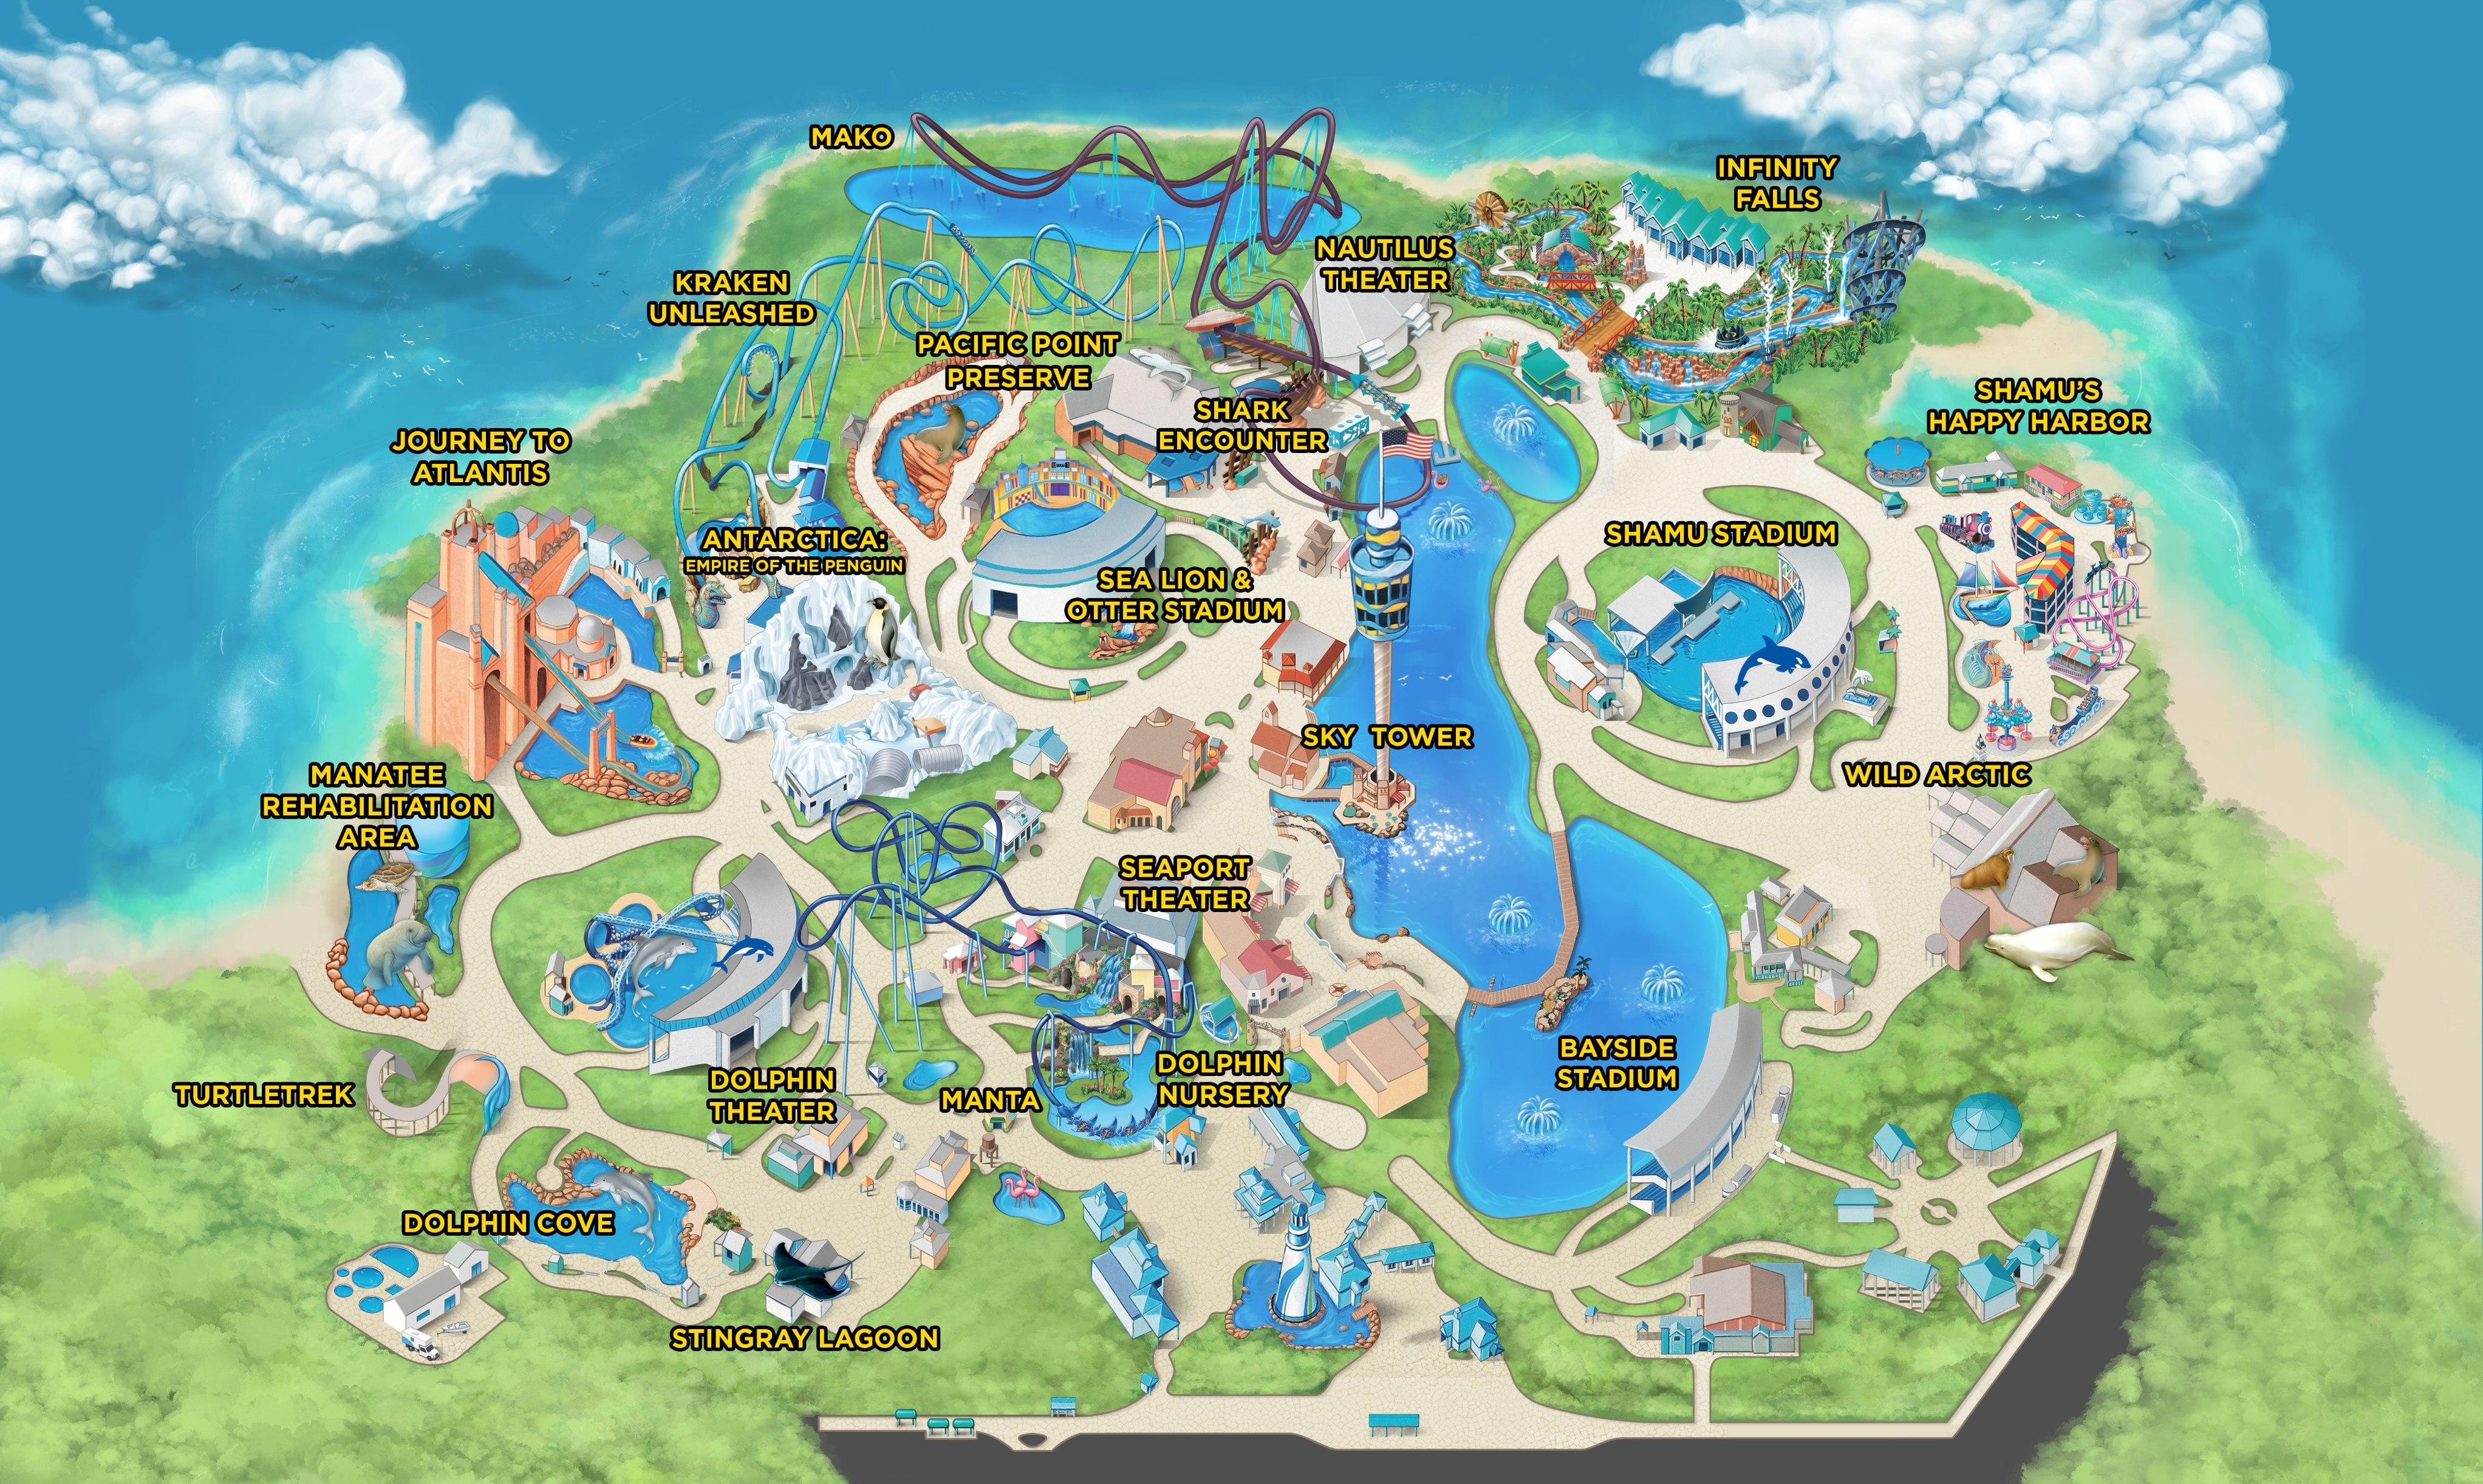 Seaworld Orlando   Seaworld Parks And Entertainment - Florida Sea World Map